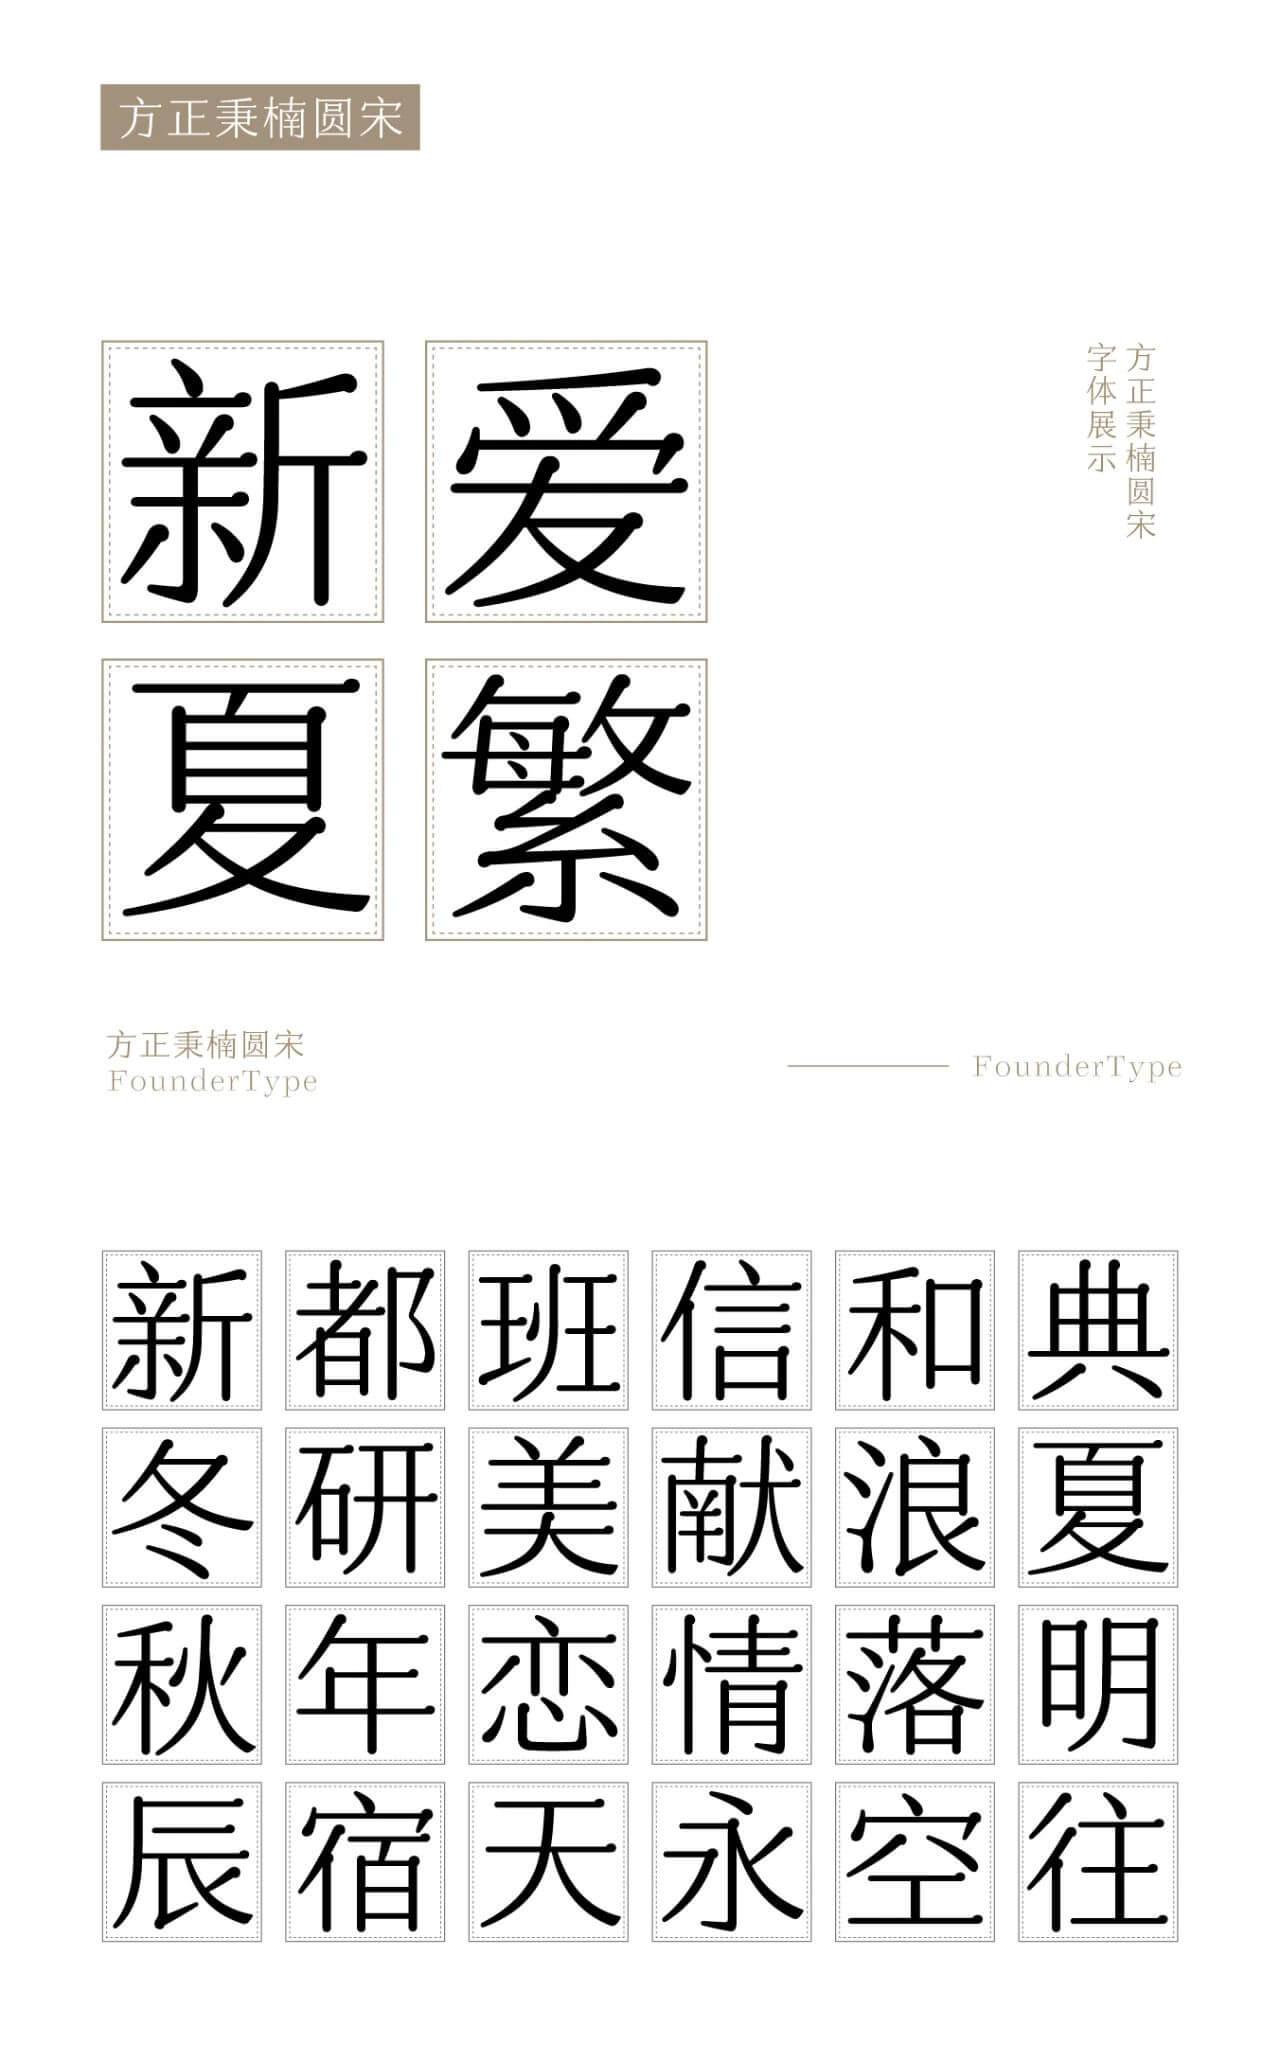 https://cdn1.zijia.com.cn/Public/Uploads/mainsort/mainsort_1598684992_4127.jpg